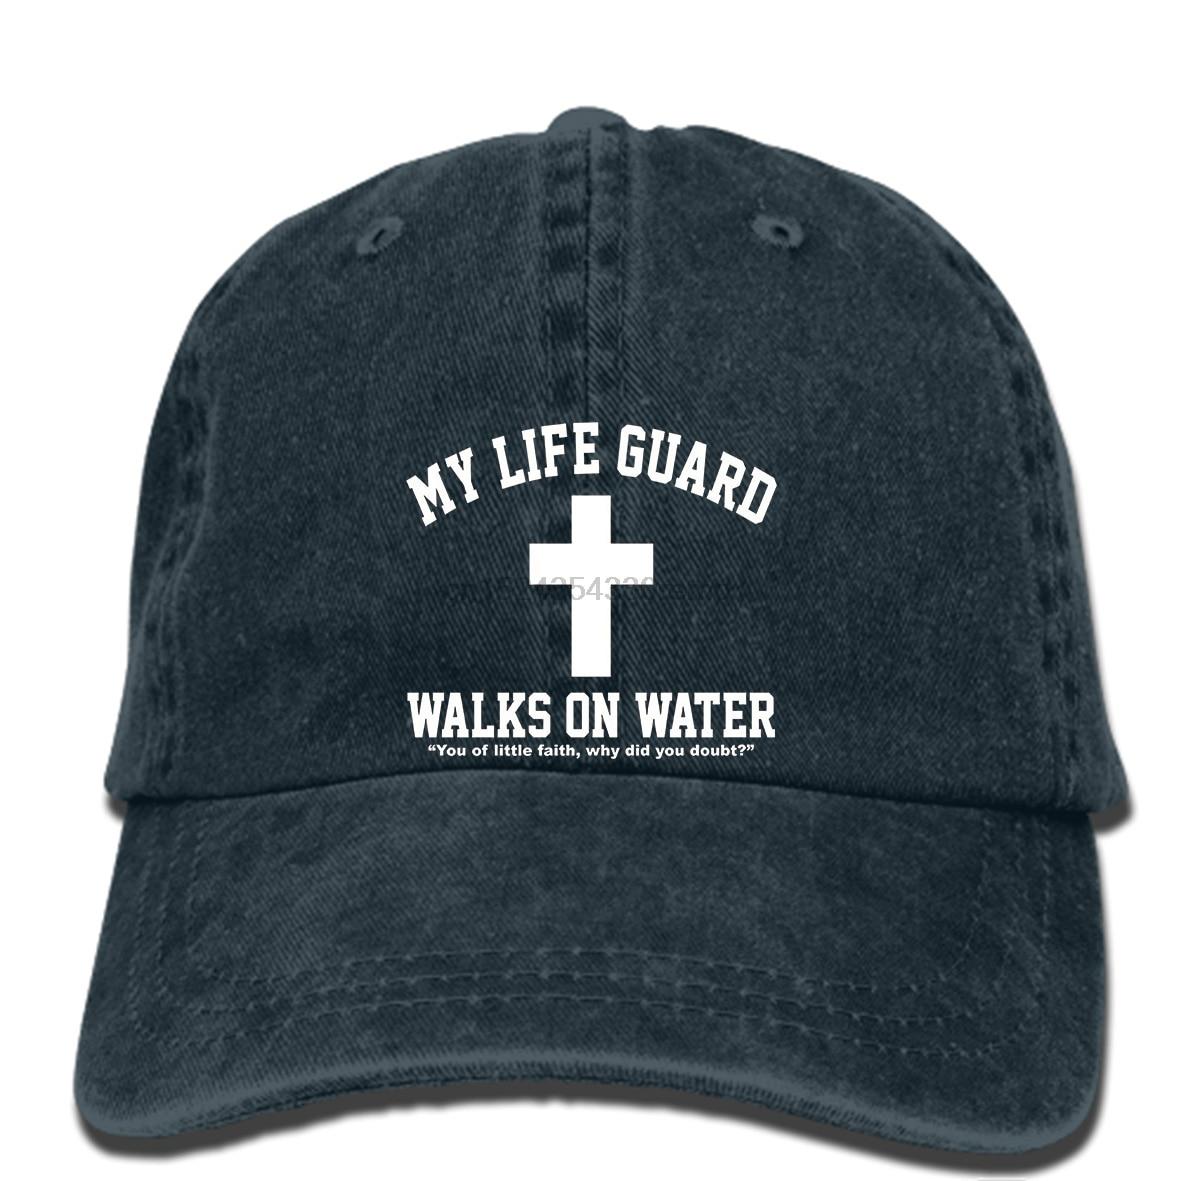 1a80d278b4c hip hop Baseball caps Loo Show Mens My Life Guard Walks On Water Jesus  Christian Black cap-in Baseball Caps from Apparel Accessories on  Aliexpress.com ...